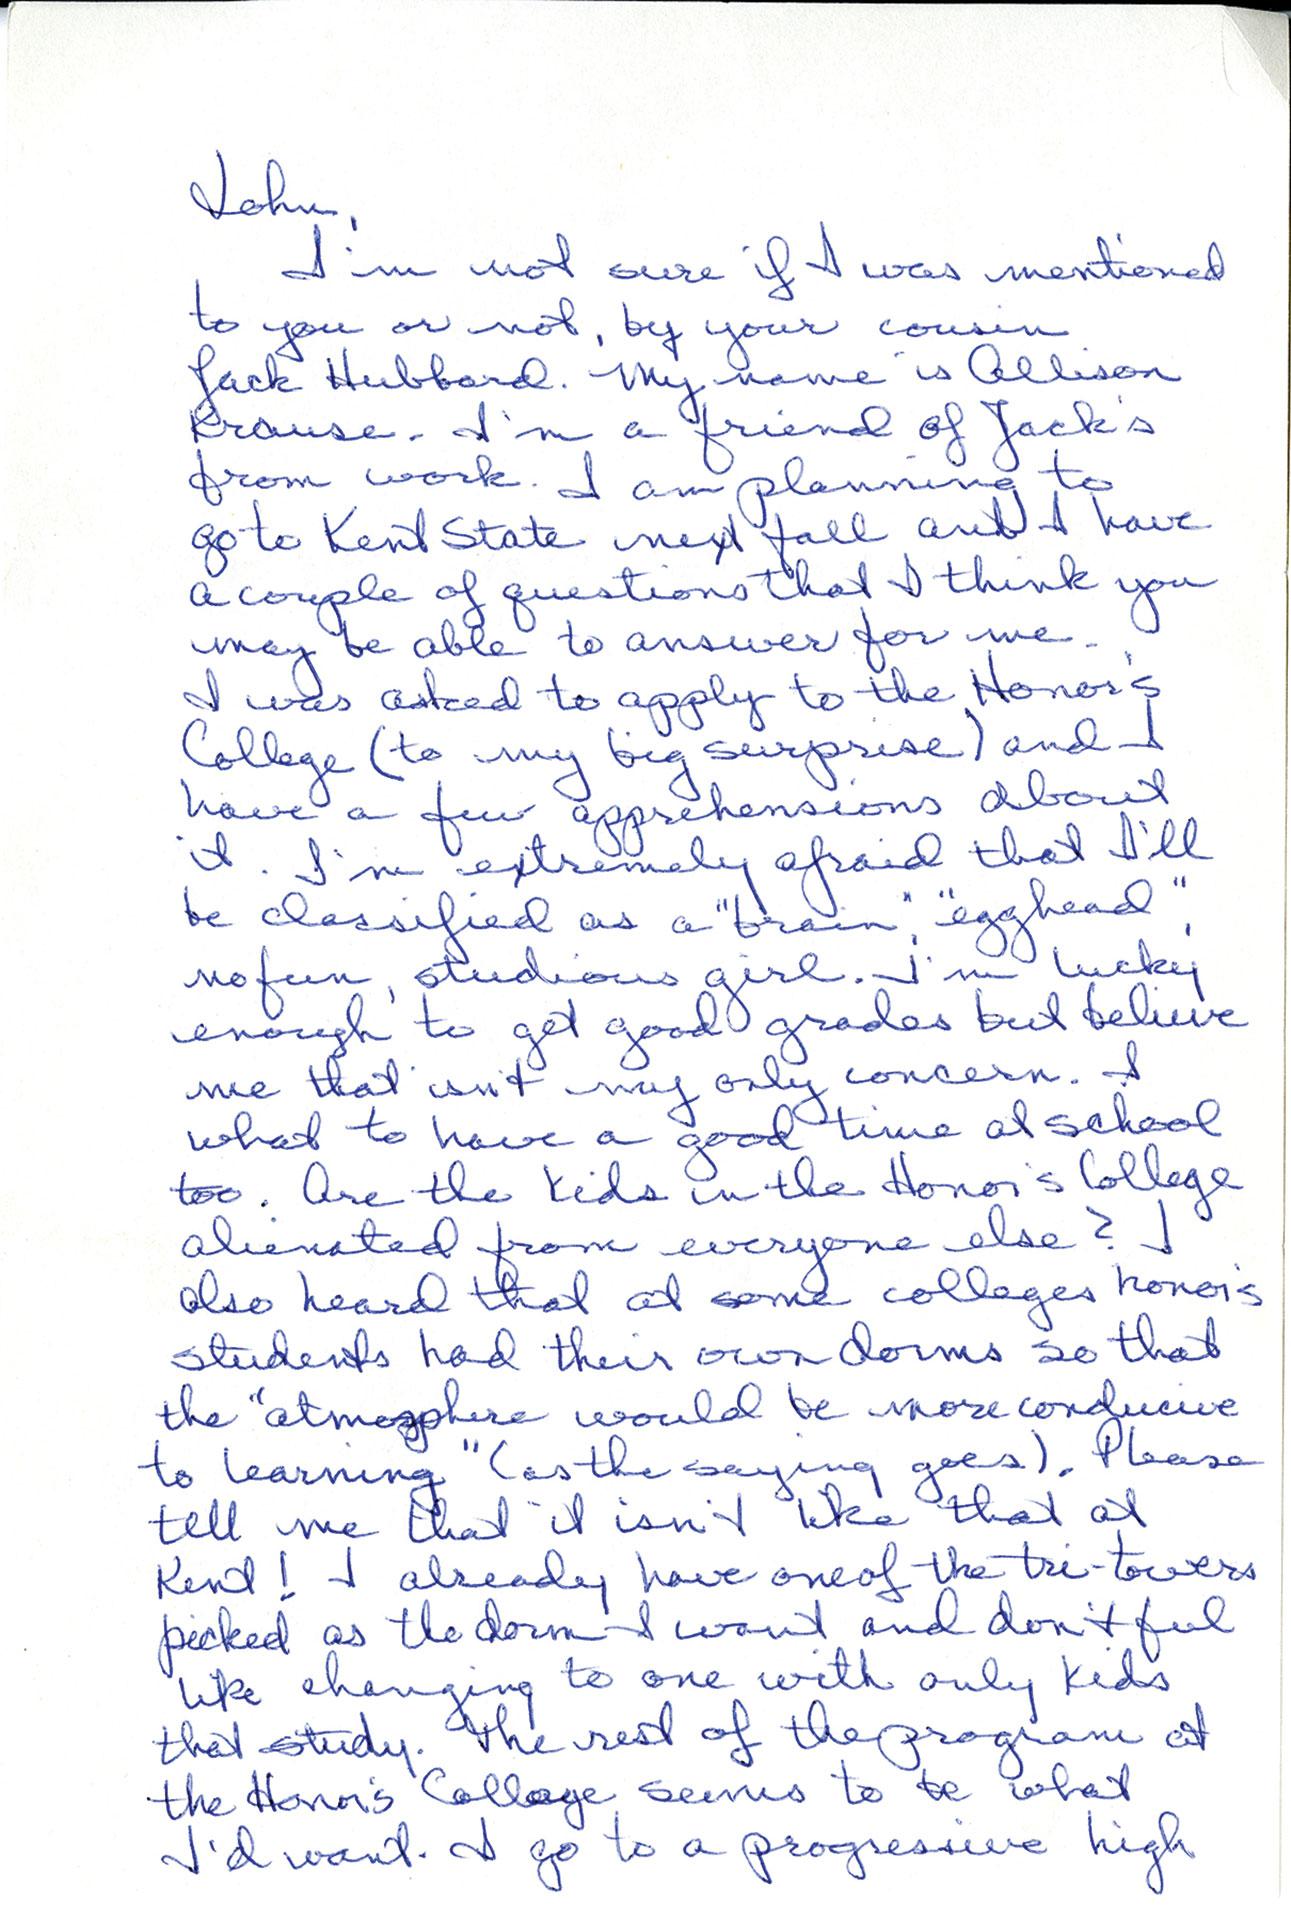 Allison_Letter